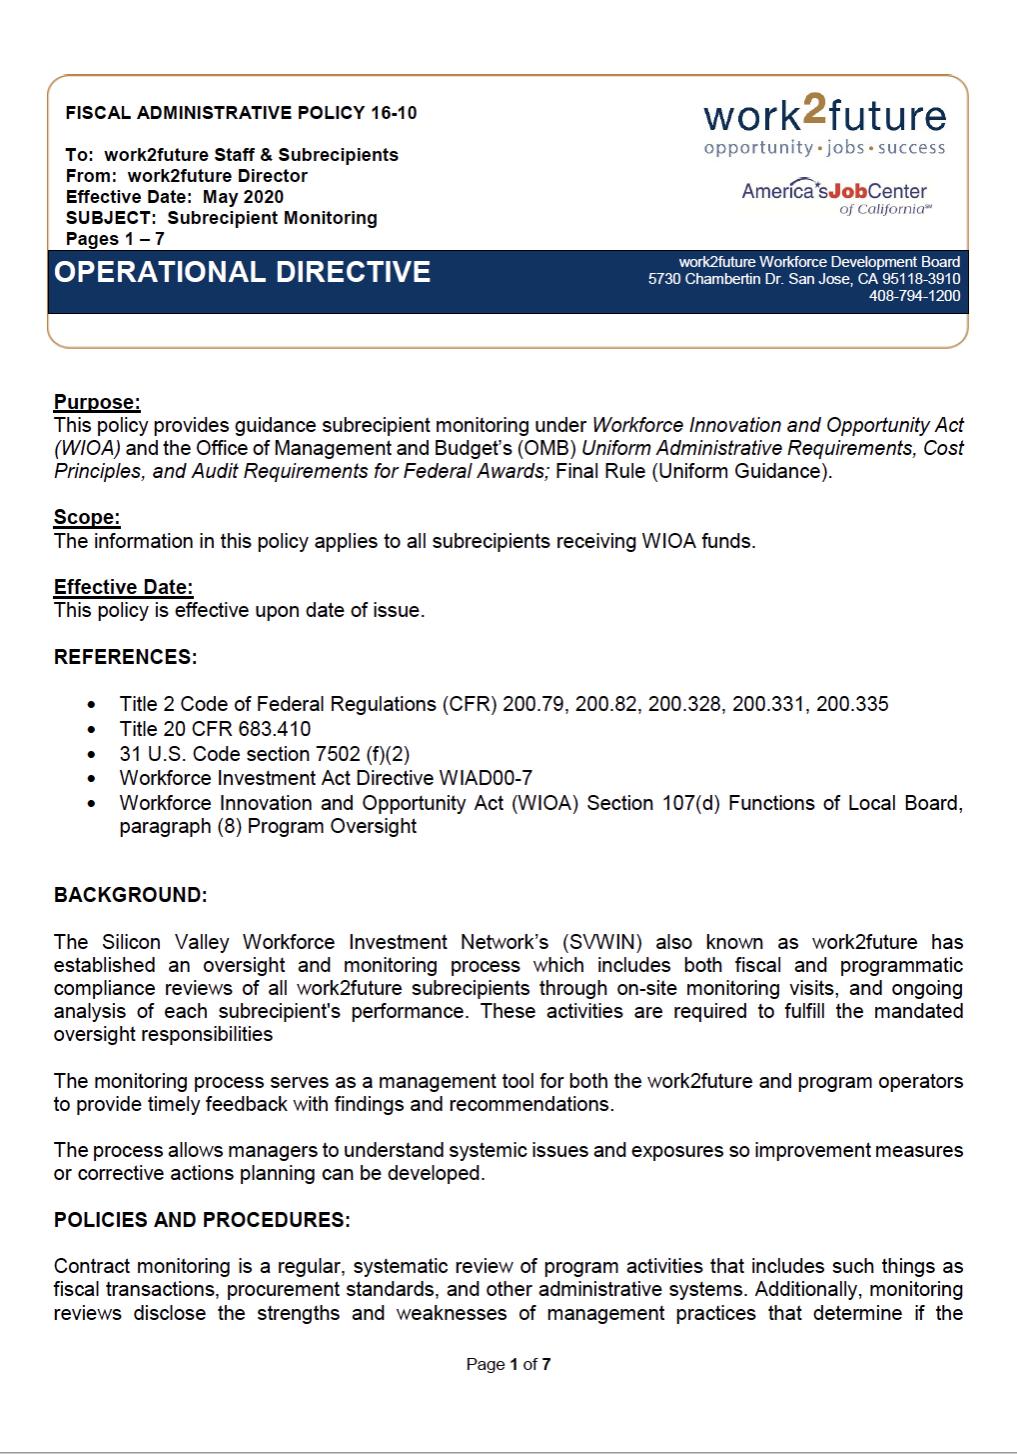 Subrecipient Monitoring | Policy+Procedure [2020]